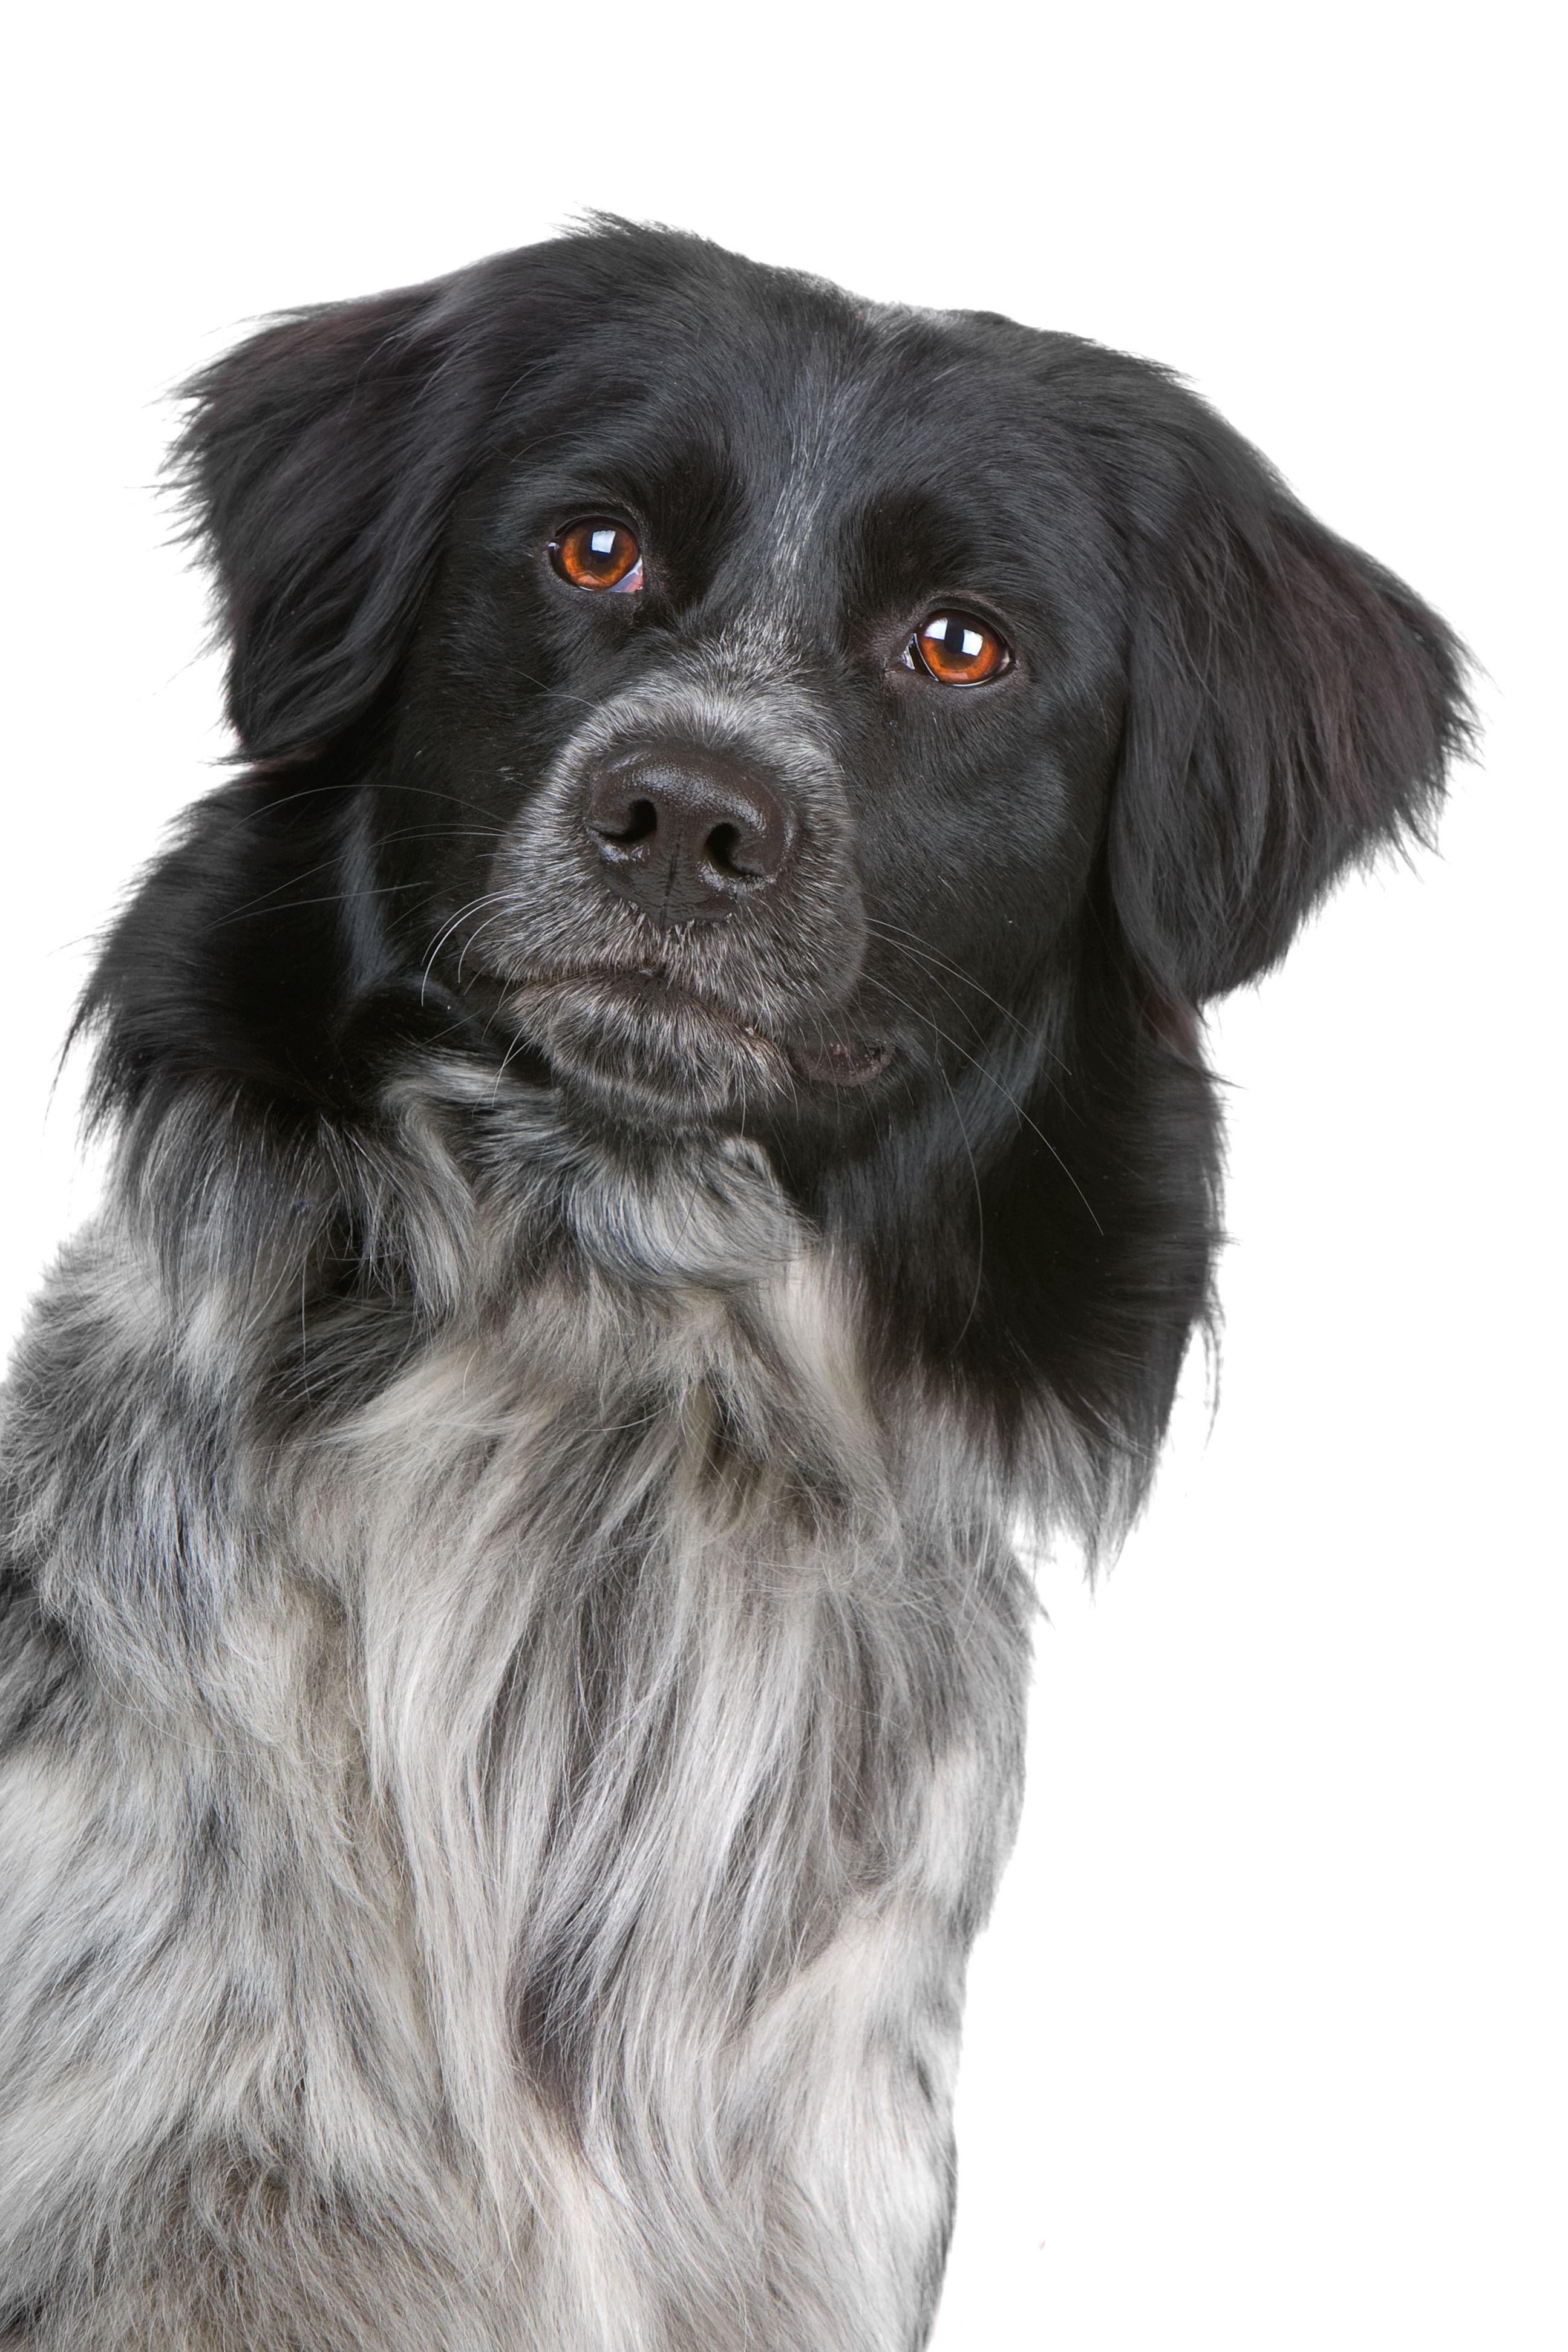 Pancreatitis A Serious, LifeThreatening Illness For Pets